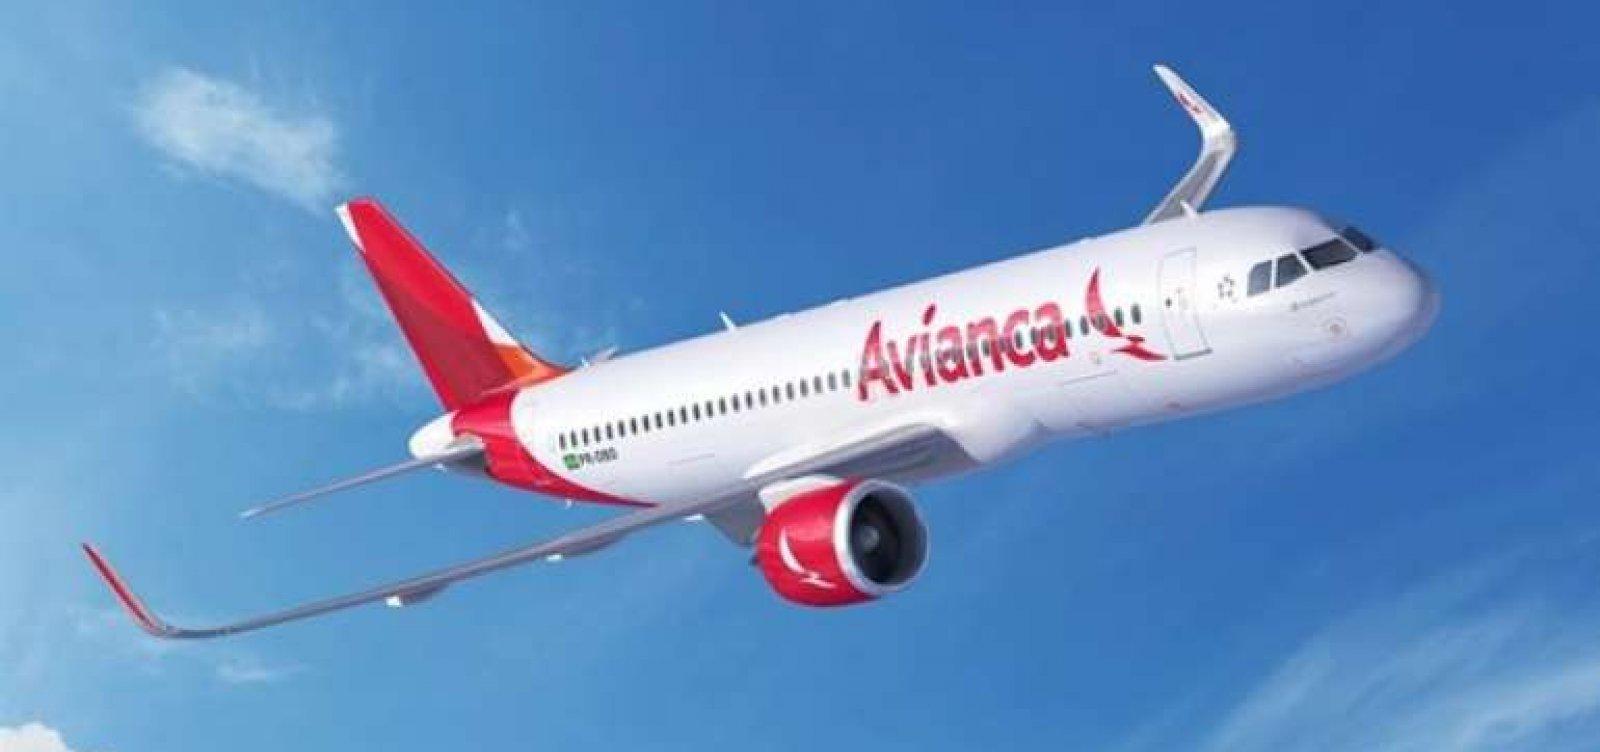 Avianca paga tarifas para operar no aeroporto de Salvador amanhã